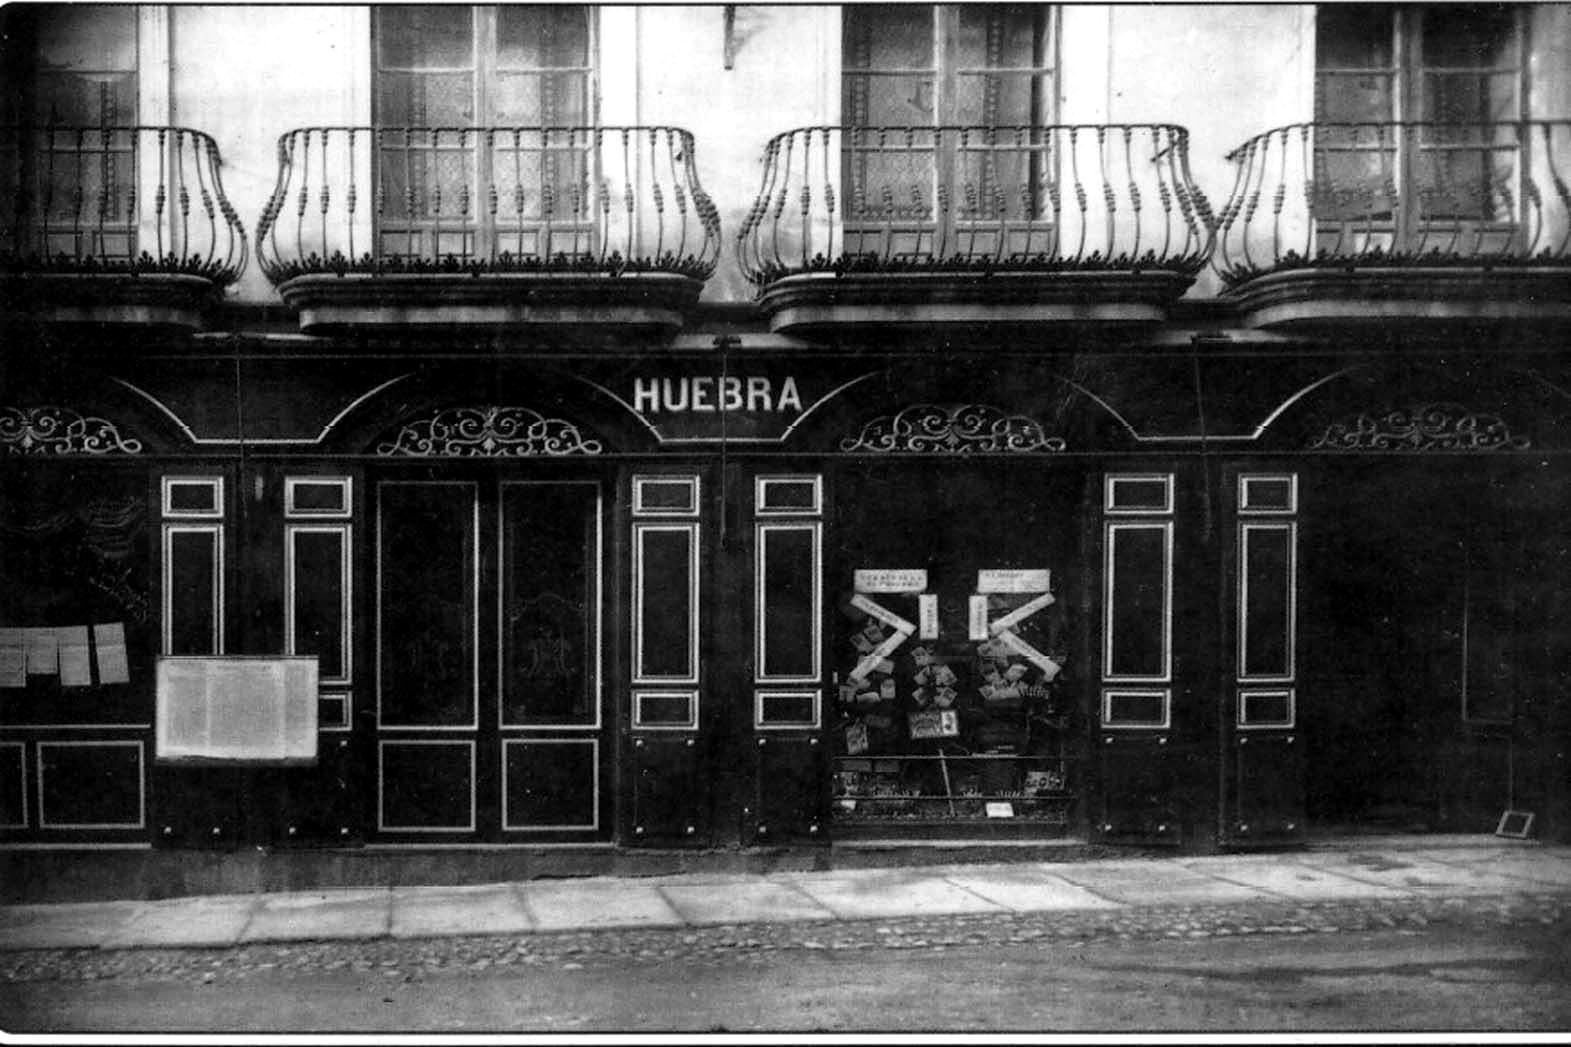 Muebles Huebra en la calle San Pablo, Luis Gonzalez de la Huebra